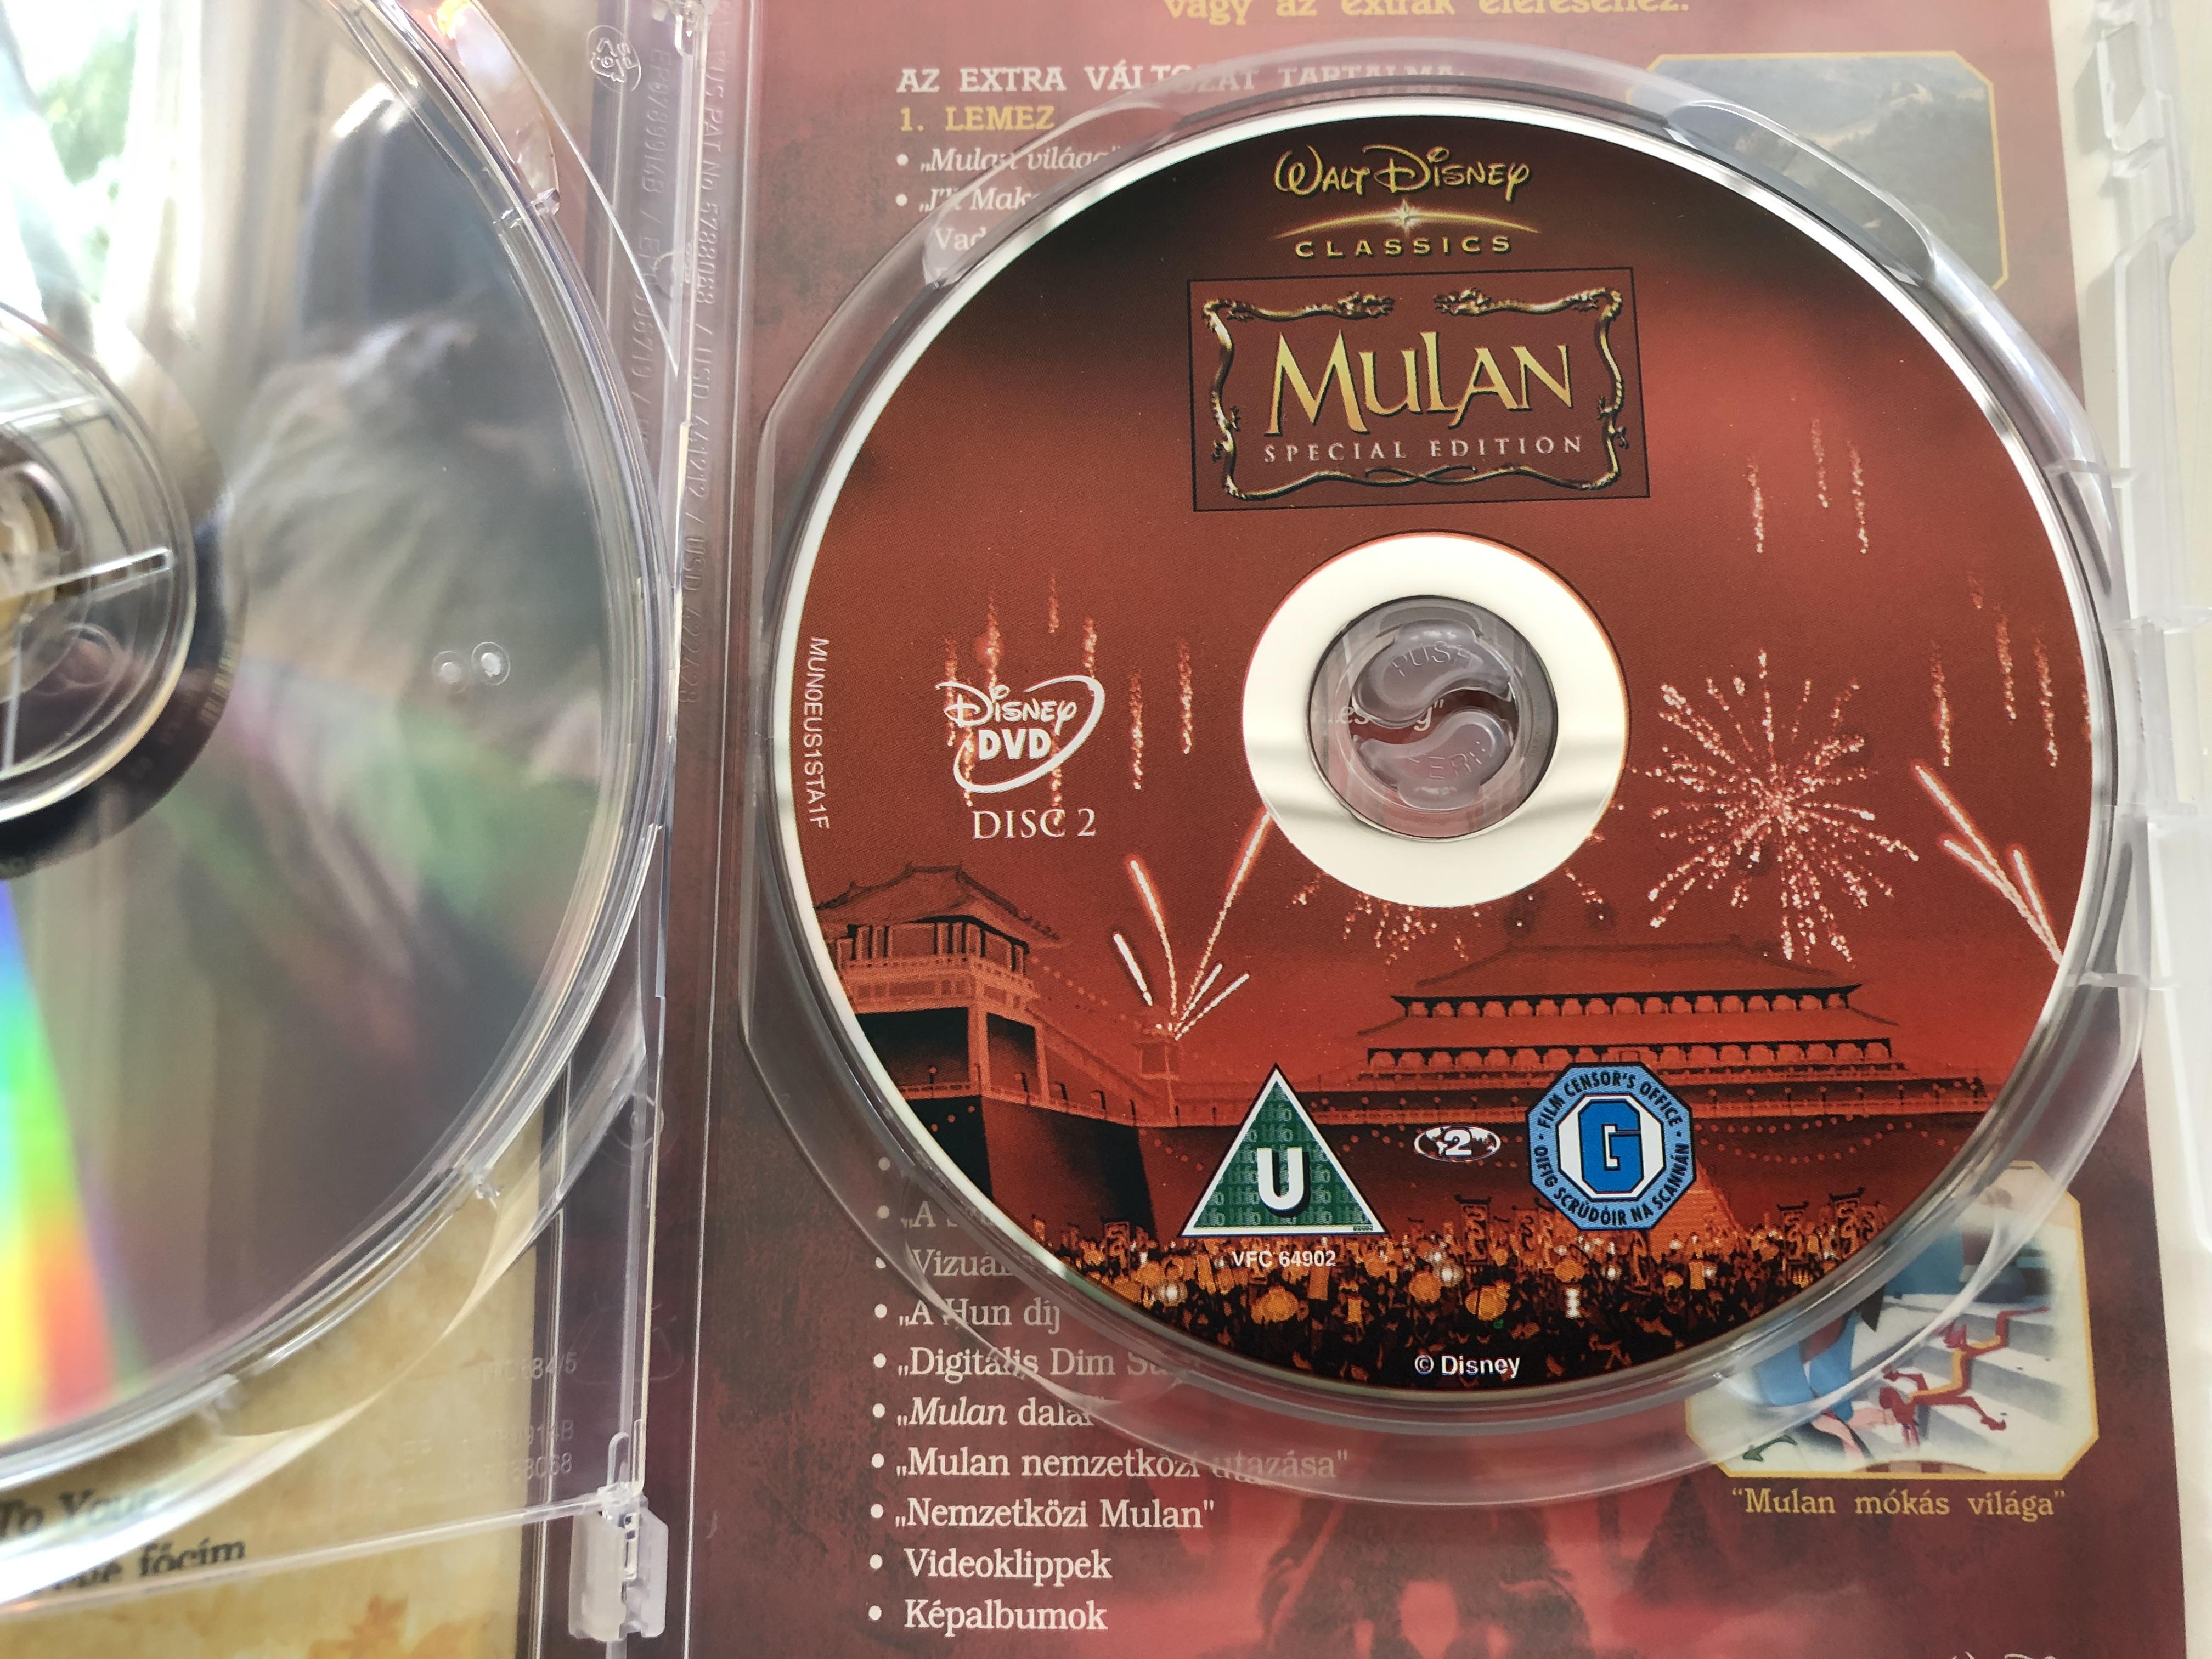 mulan-special-edition-2-dvd-1998-mulan-extra-v-ltozat-duplalemezes-extra-v-ltozat-directed-by-barry-cook-tony-bancroft-starring-ming-na-wen-eddie-murphy-bd-wong-miguel-ferrer-june-foray-3-.jpg